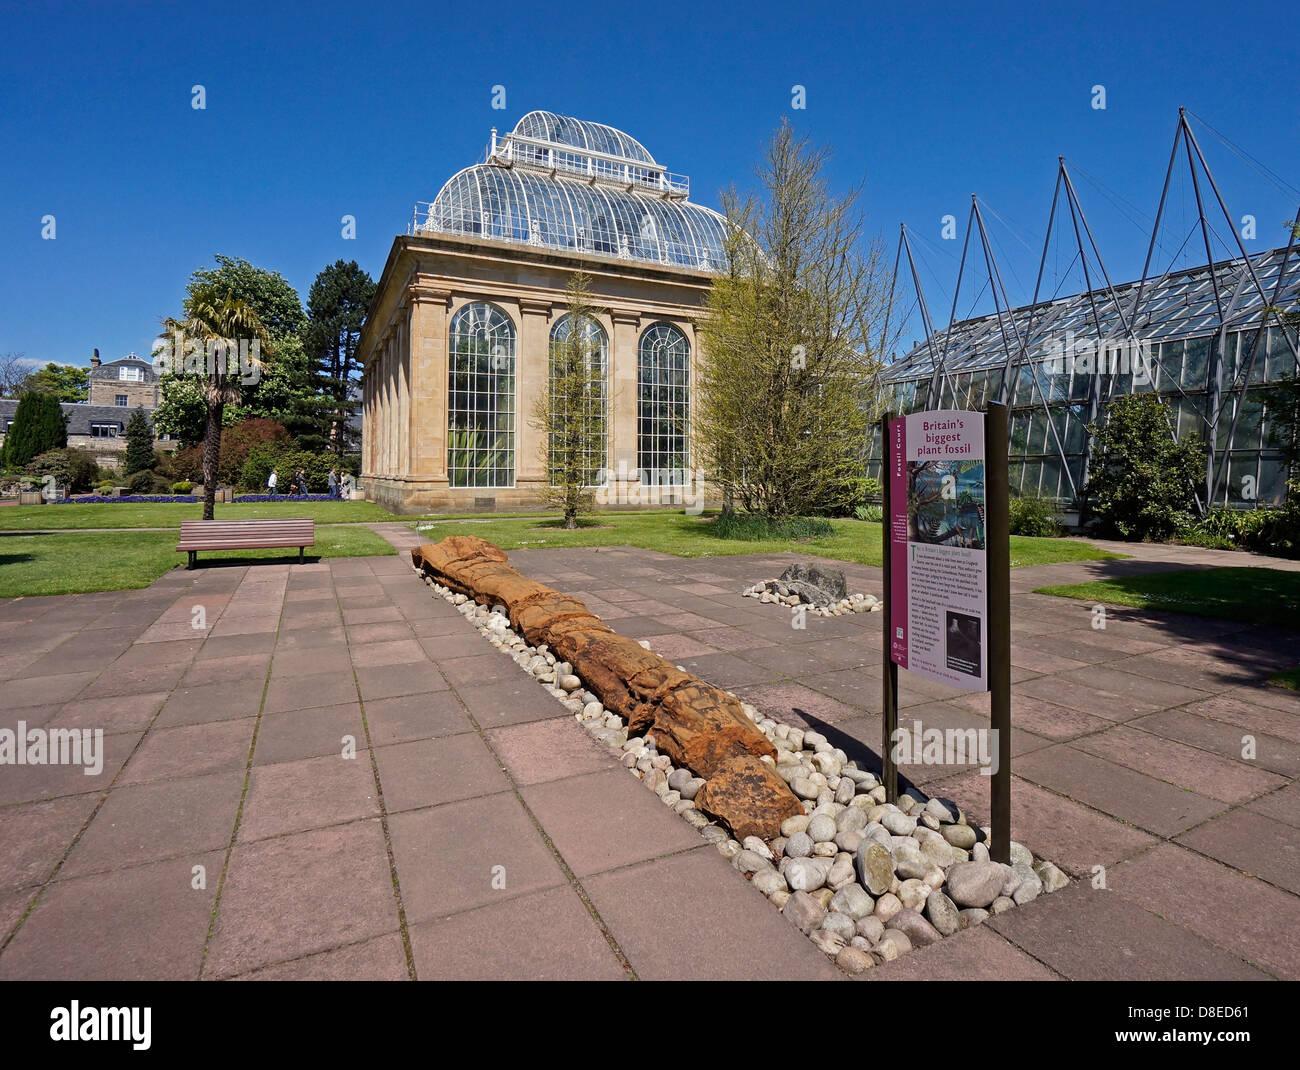 Fossil Courtyard and Palm House in Royal Botanic Garden Edinburgh Scotland - Stock Image